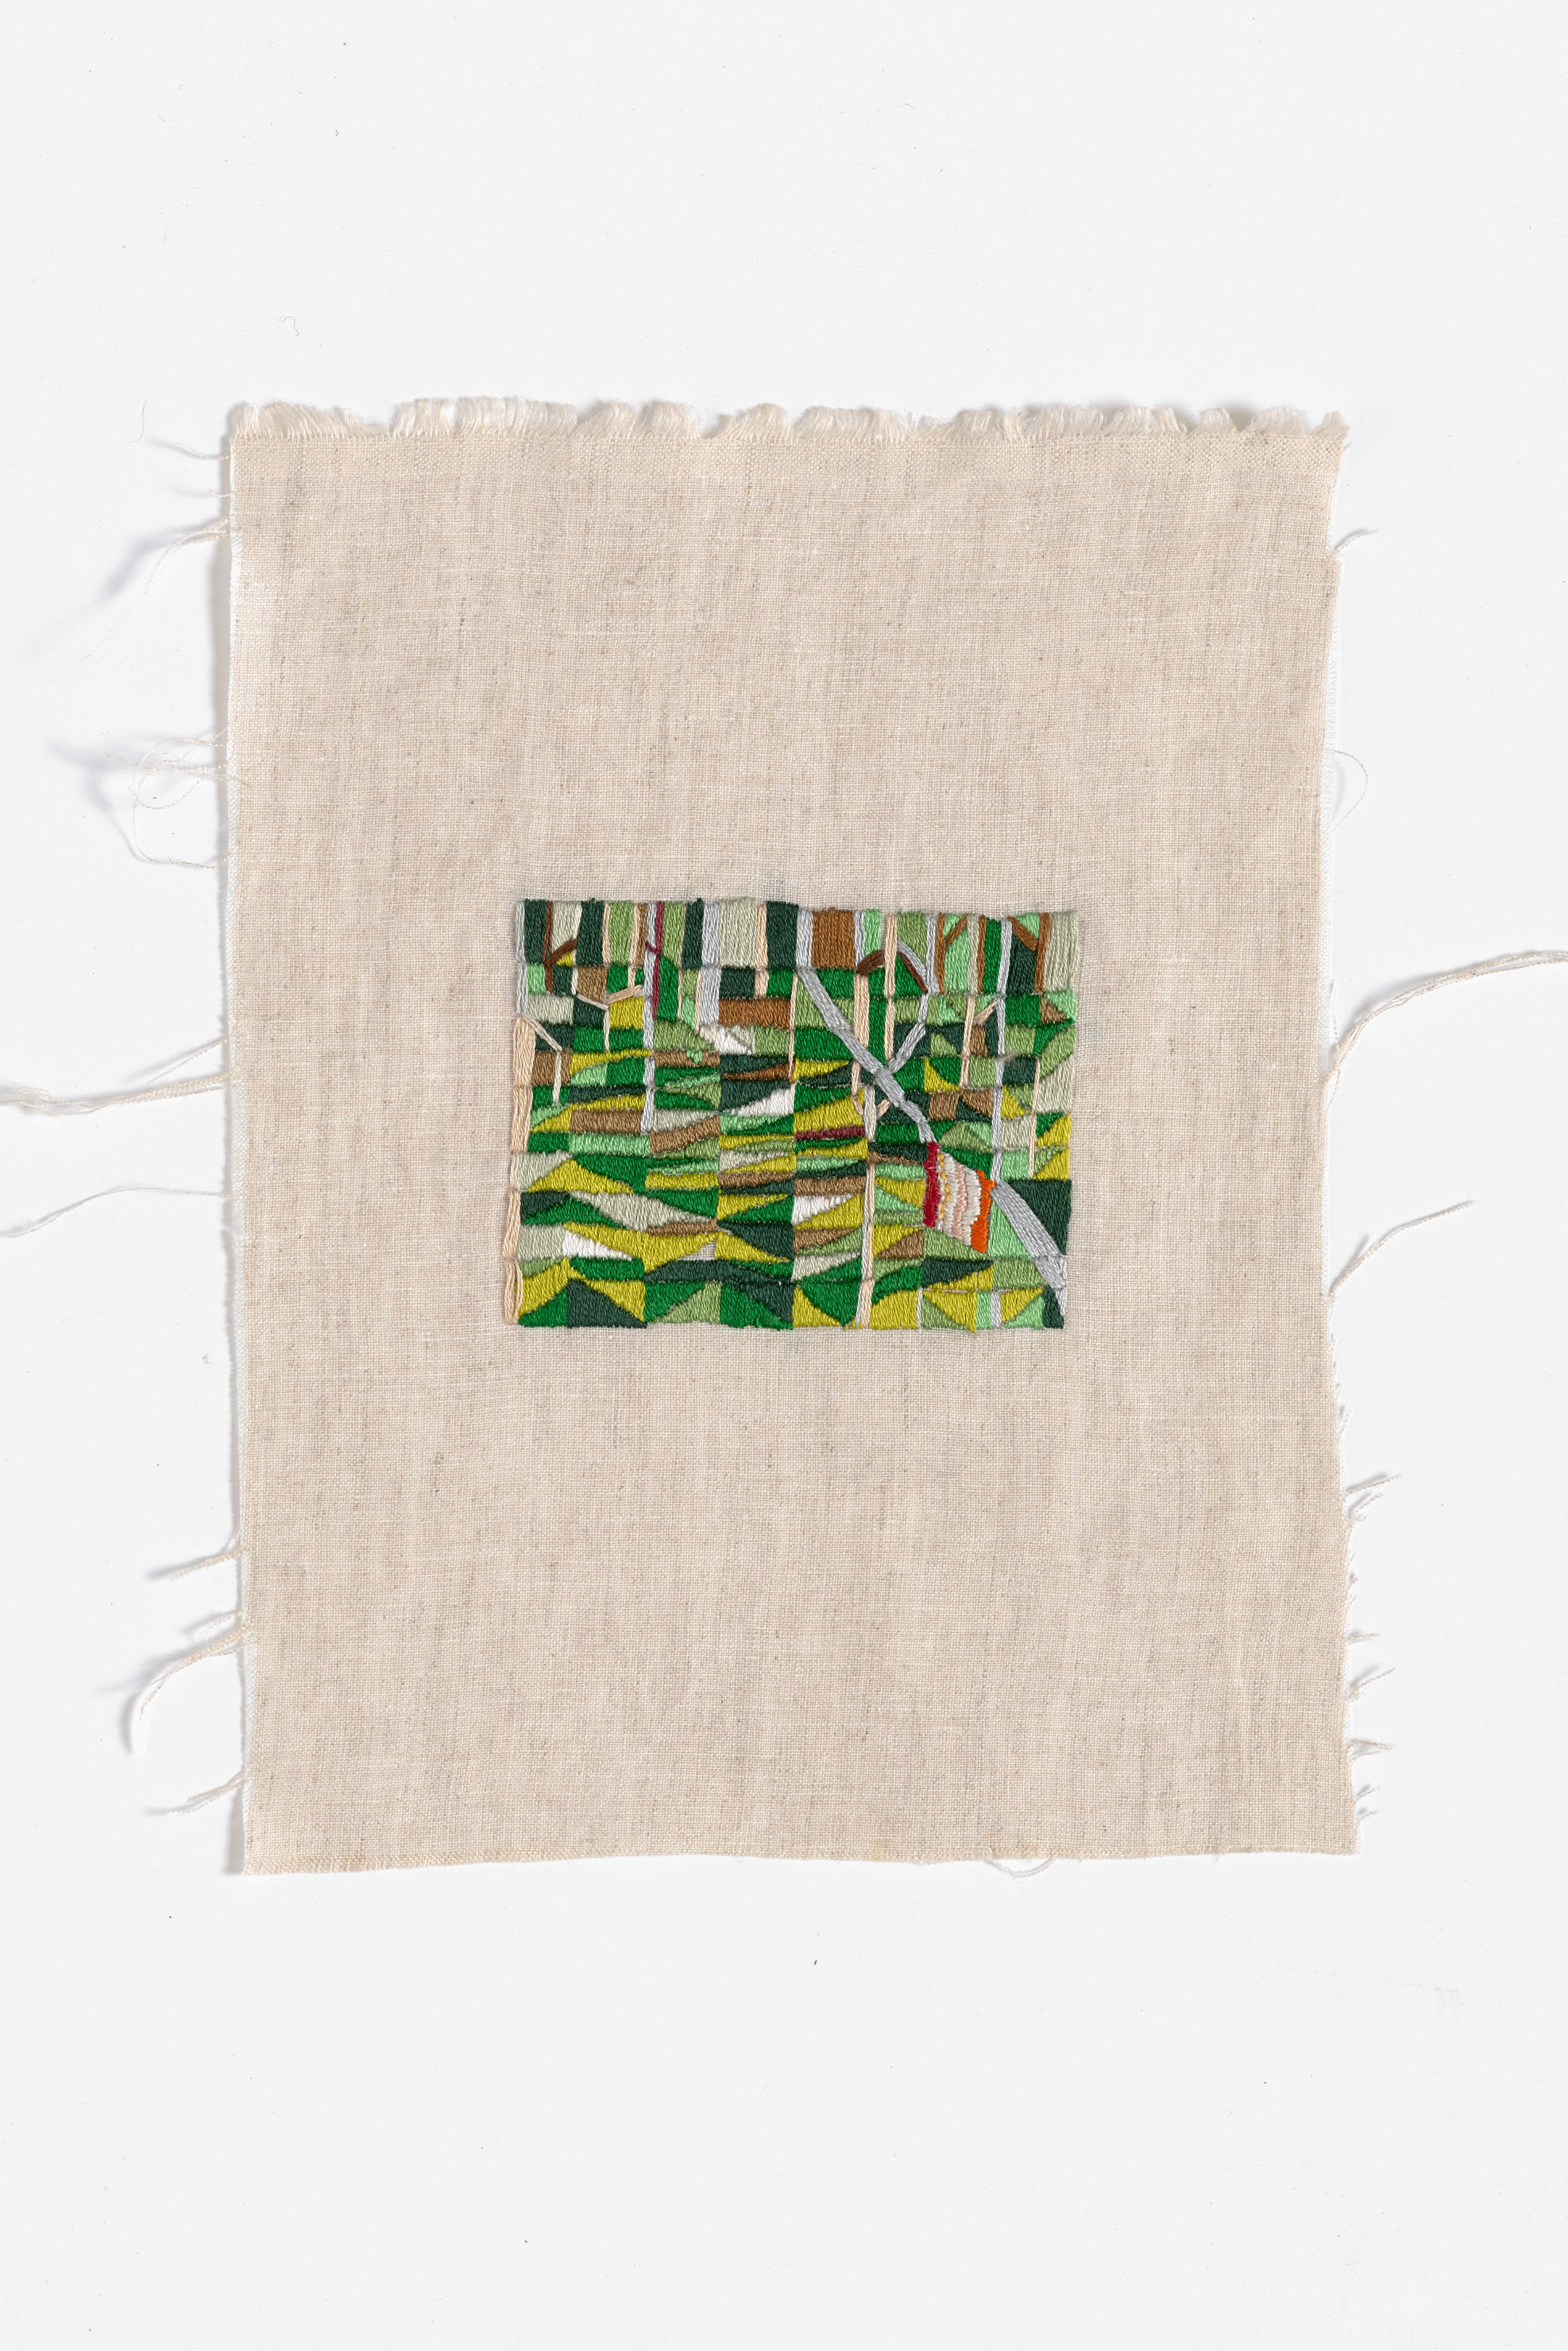 Back of camp, Walkerville  2015 Cotton thread on linen 19 x 25cm